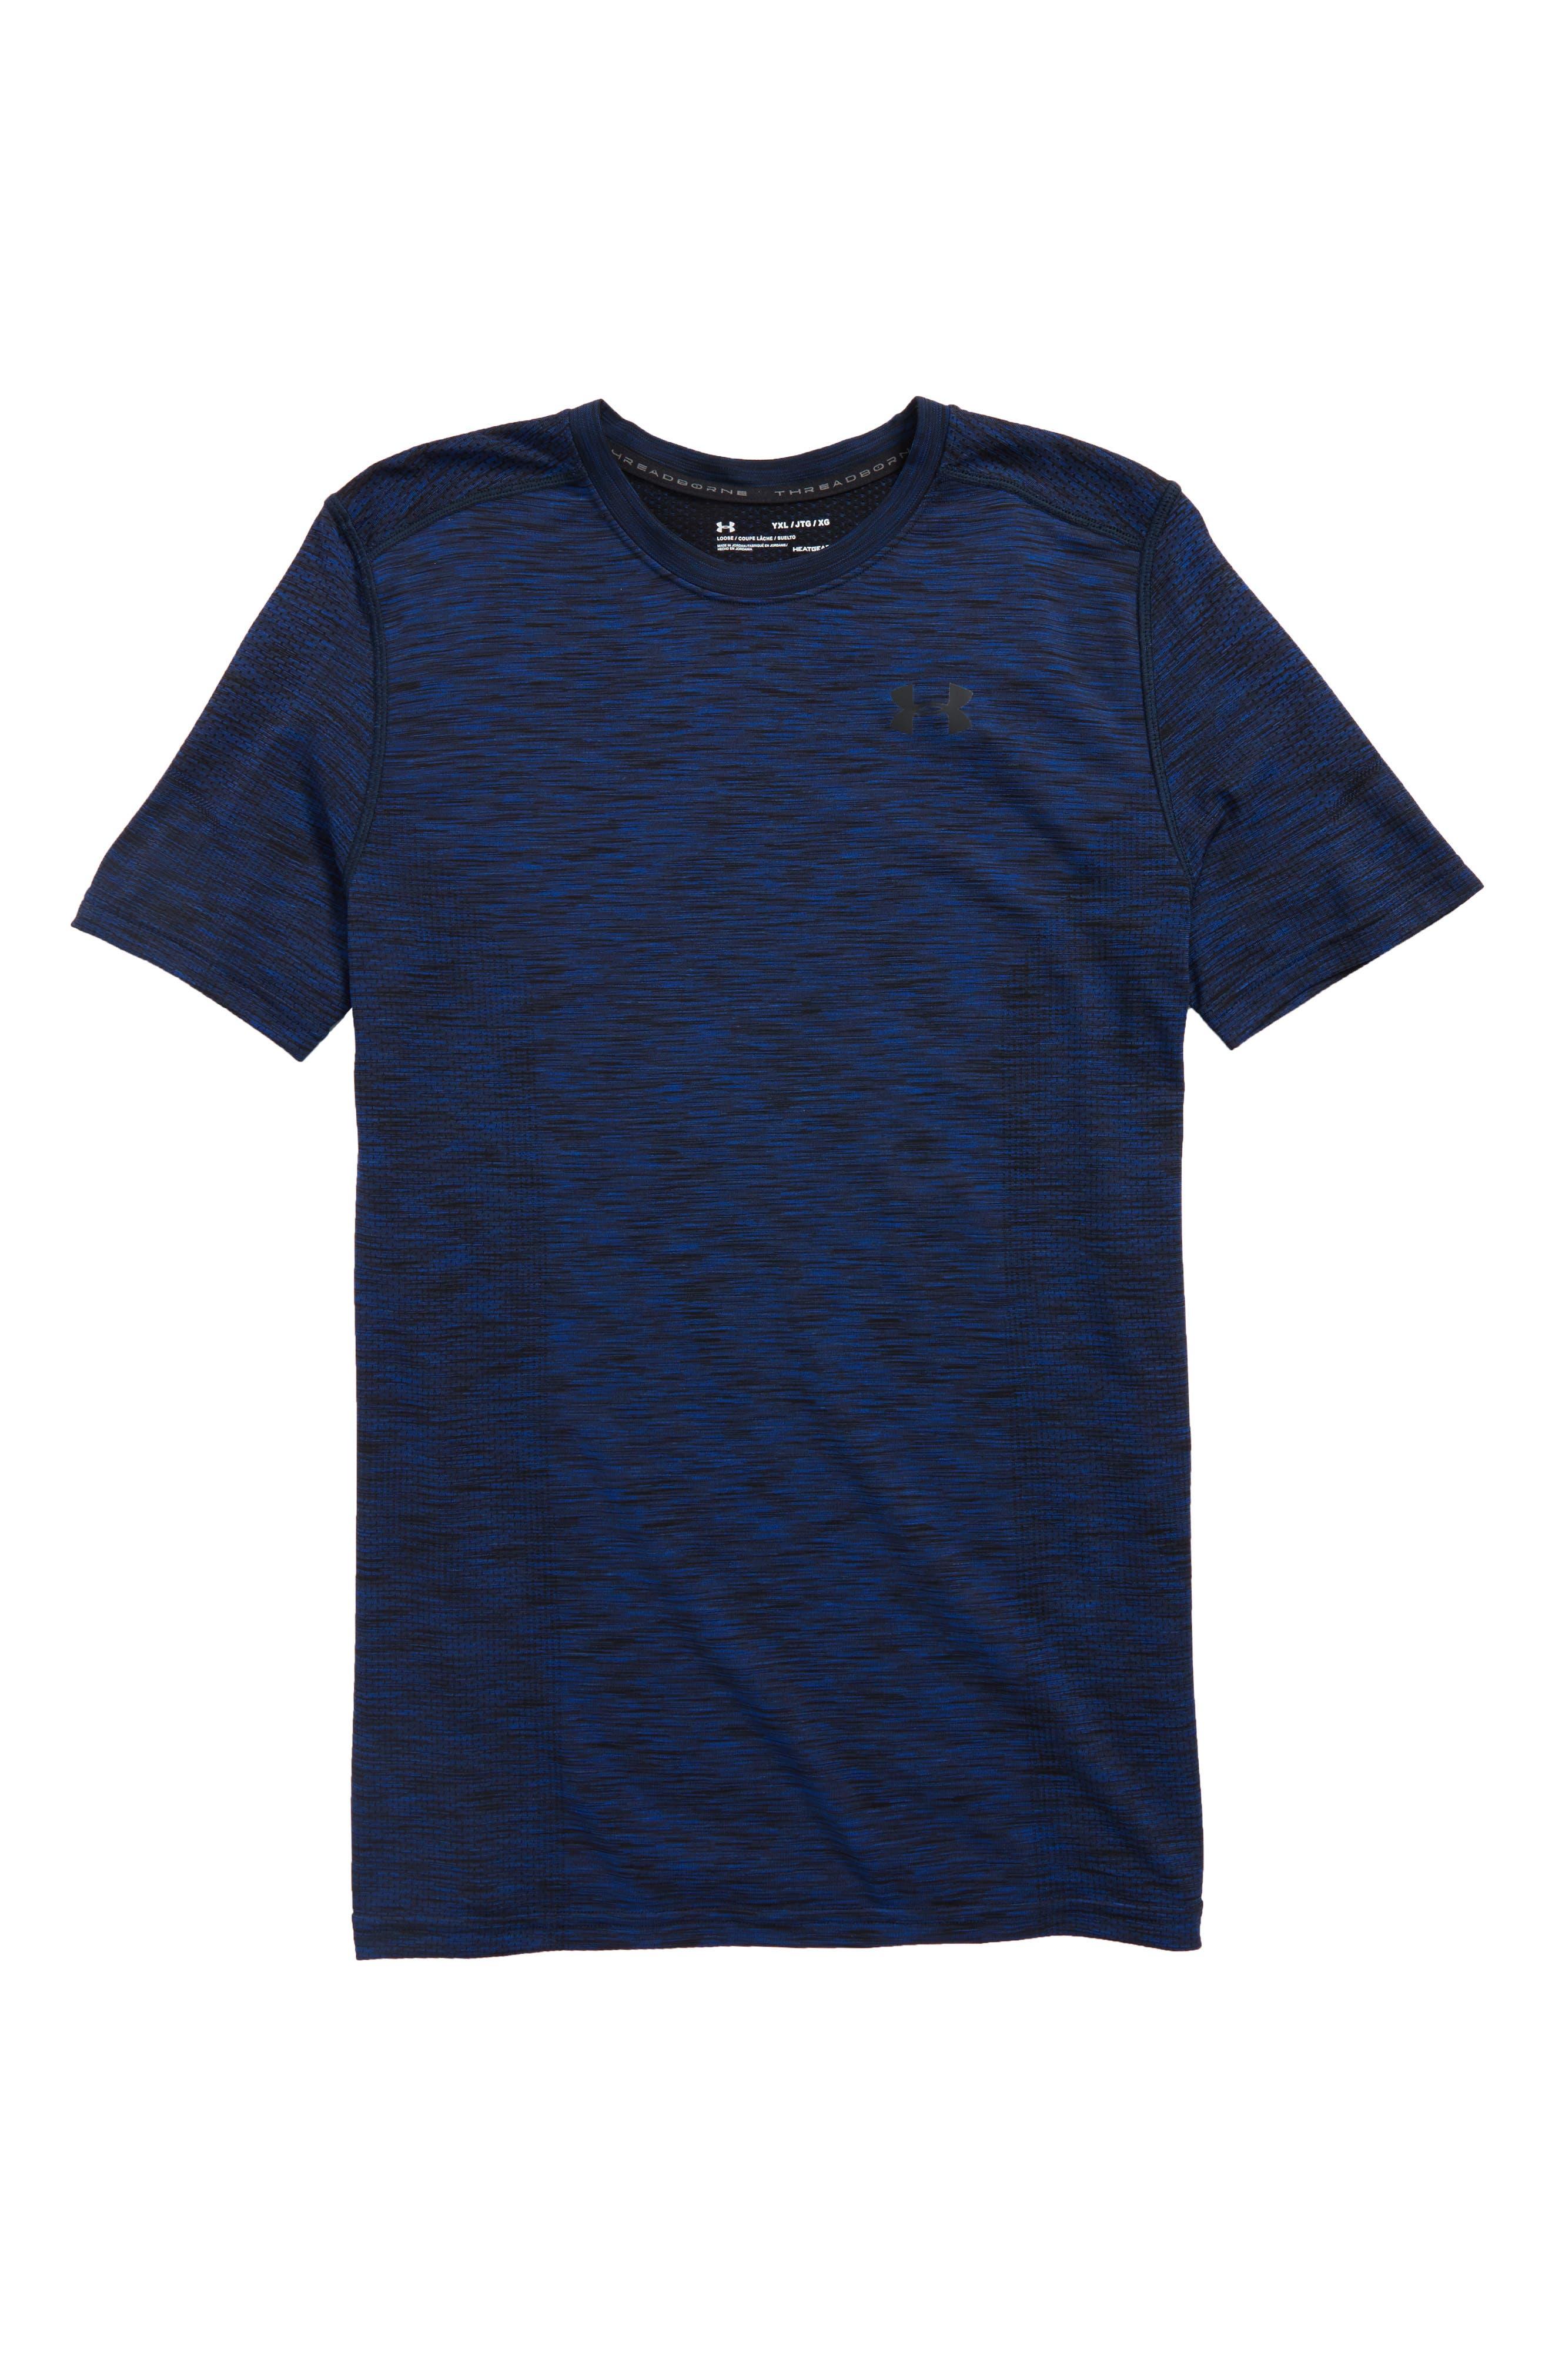 Main Image - Under Armour Threadborne HeatGear® Shirt (Little Boys & Big Boys)